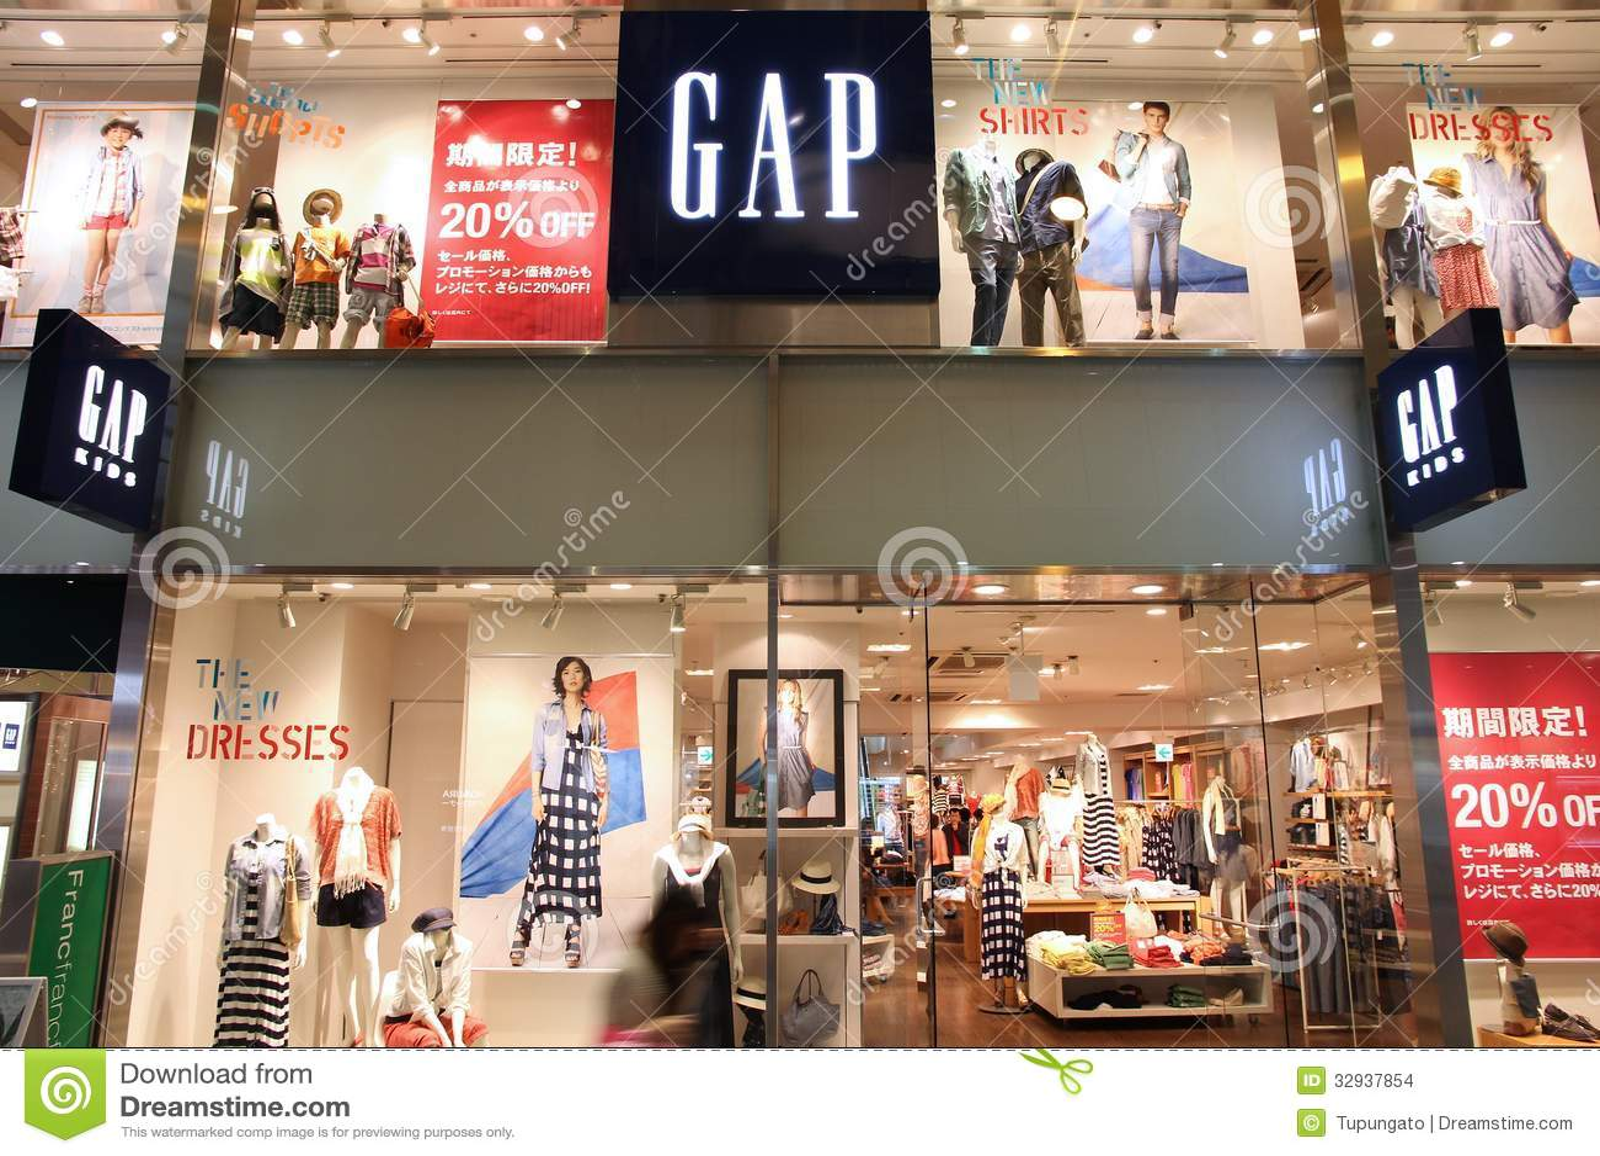 Papaya clothing store locations. Girls clothing stores